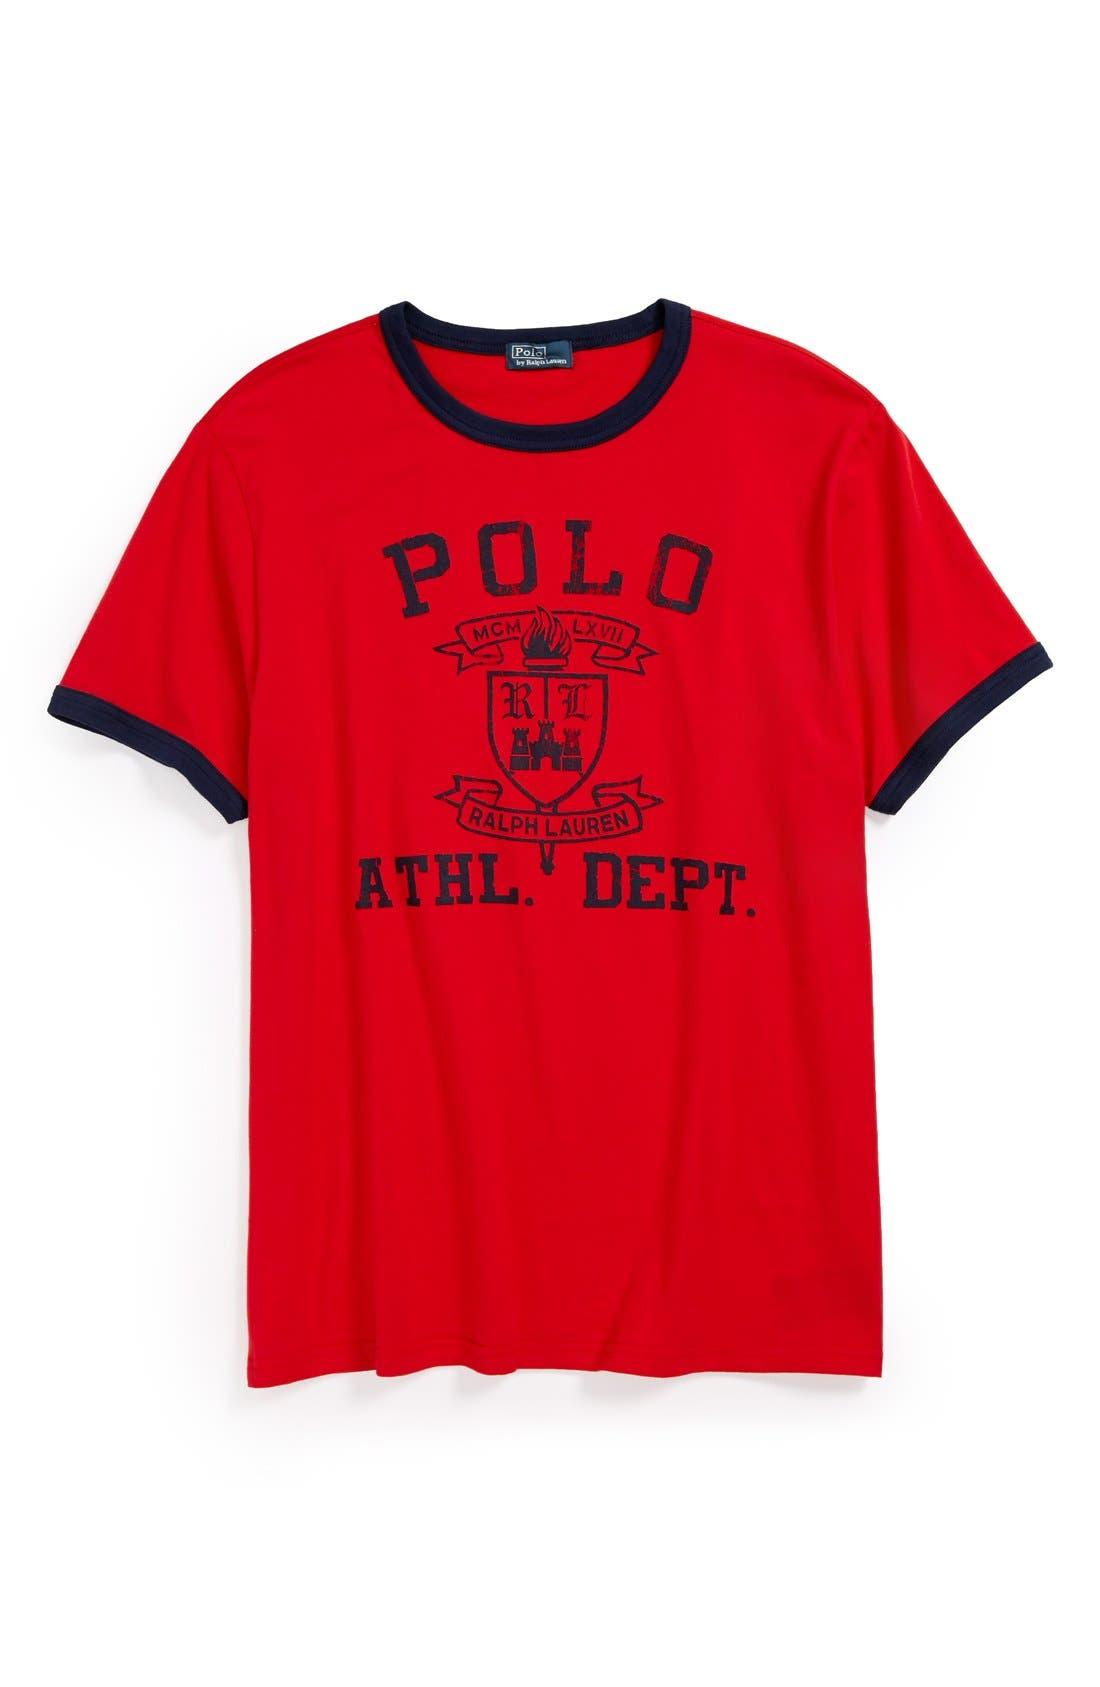 Alternate Image 1 Selected - Ralph Lauren Graphic T-Shirt (Big Boys)